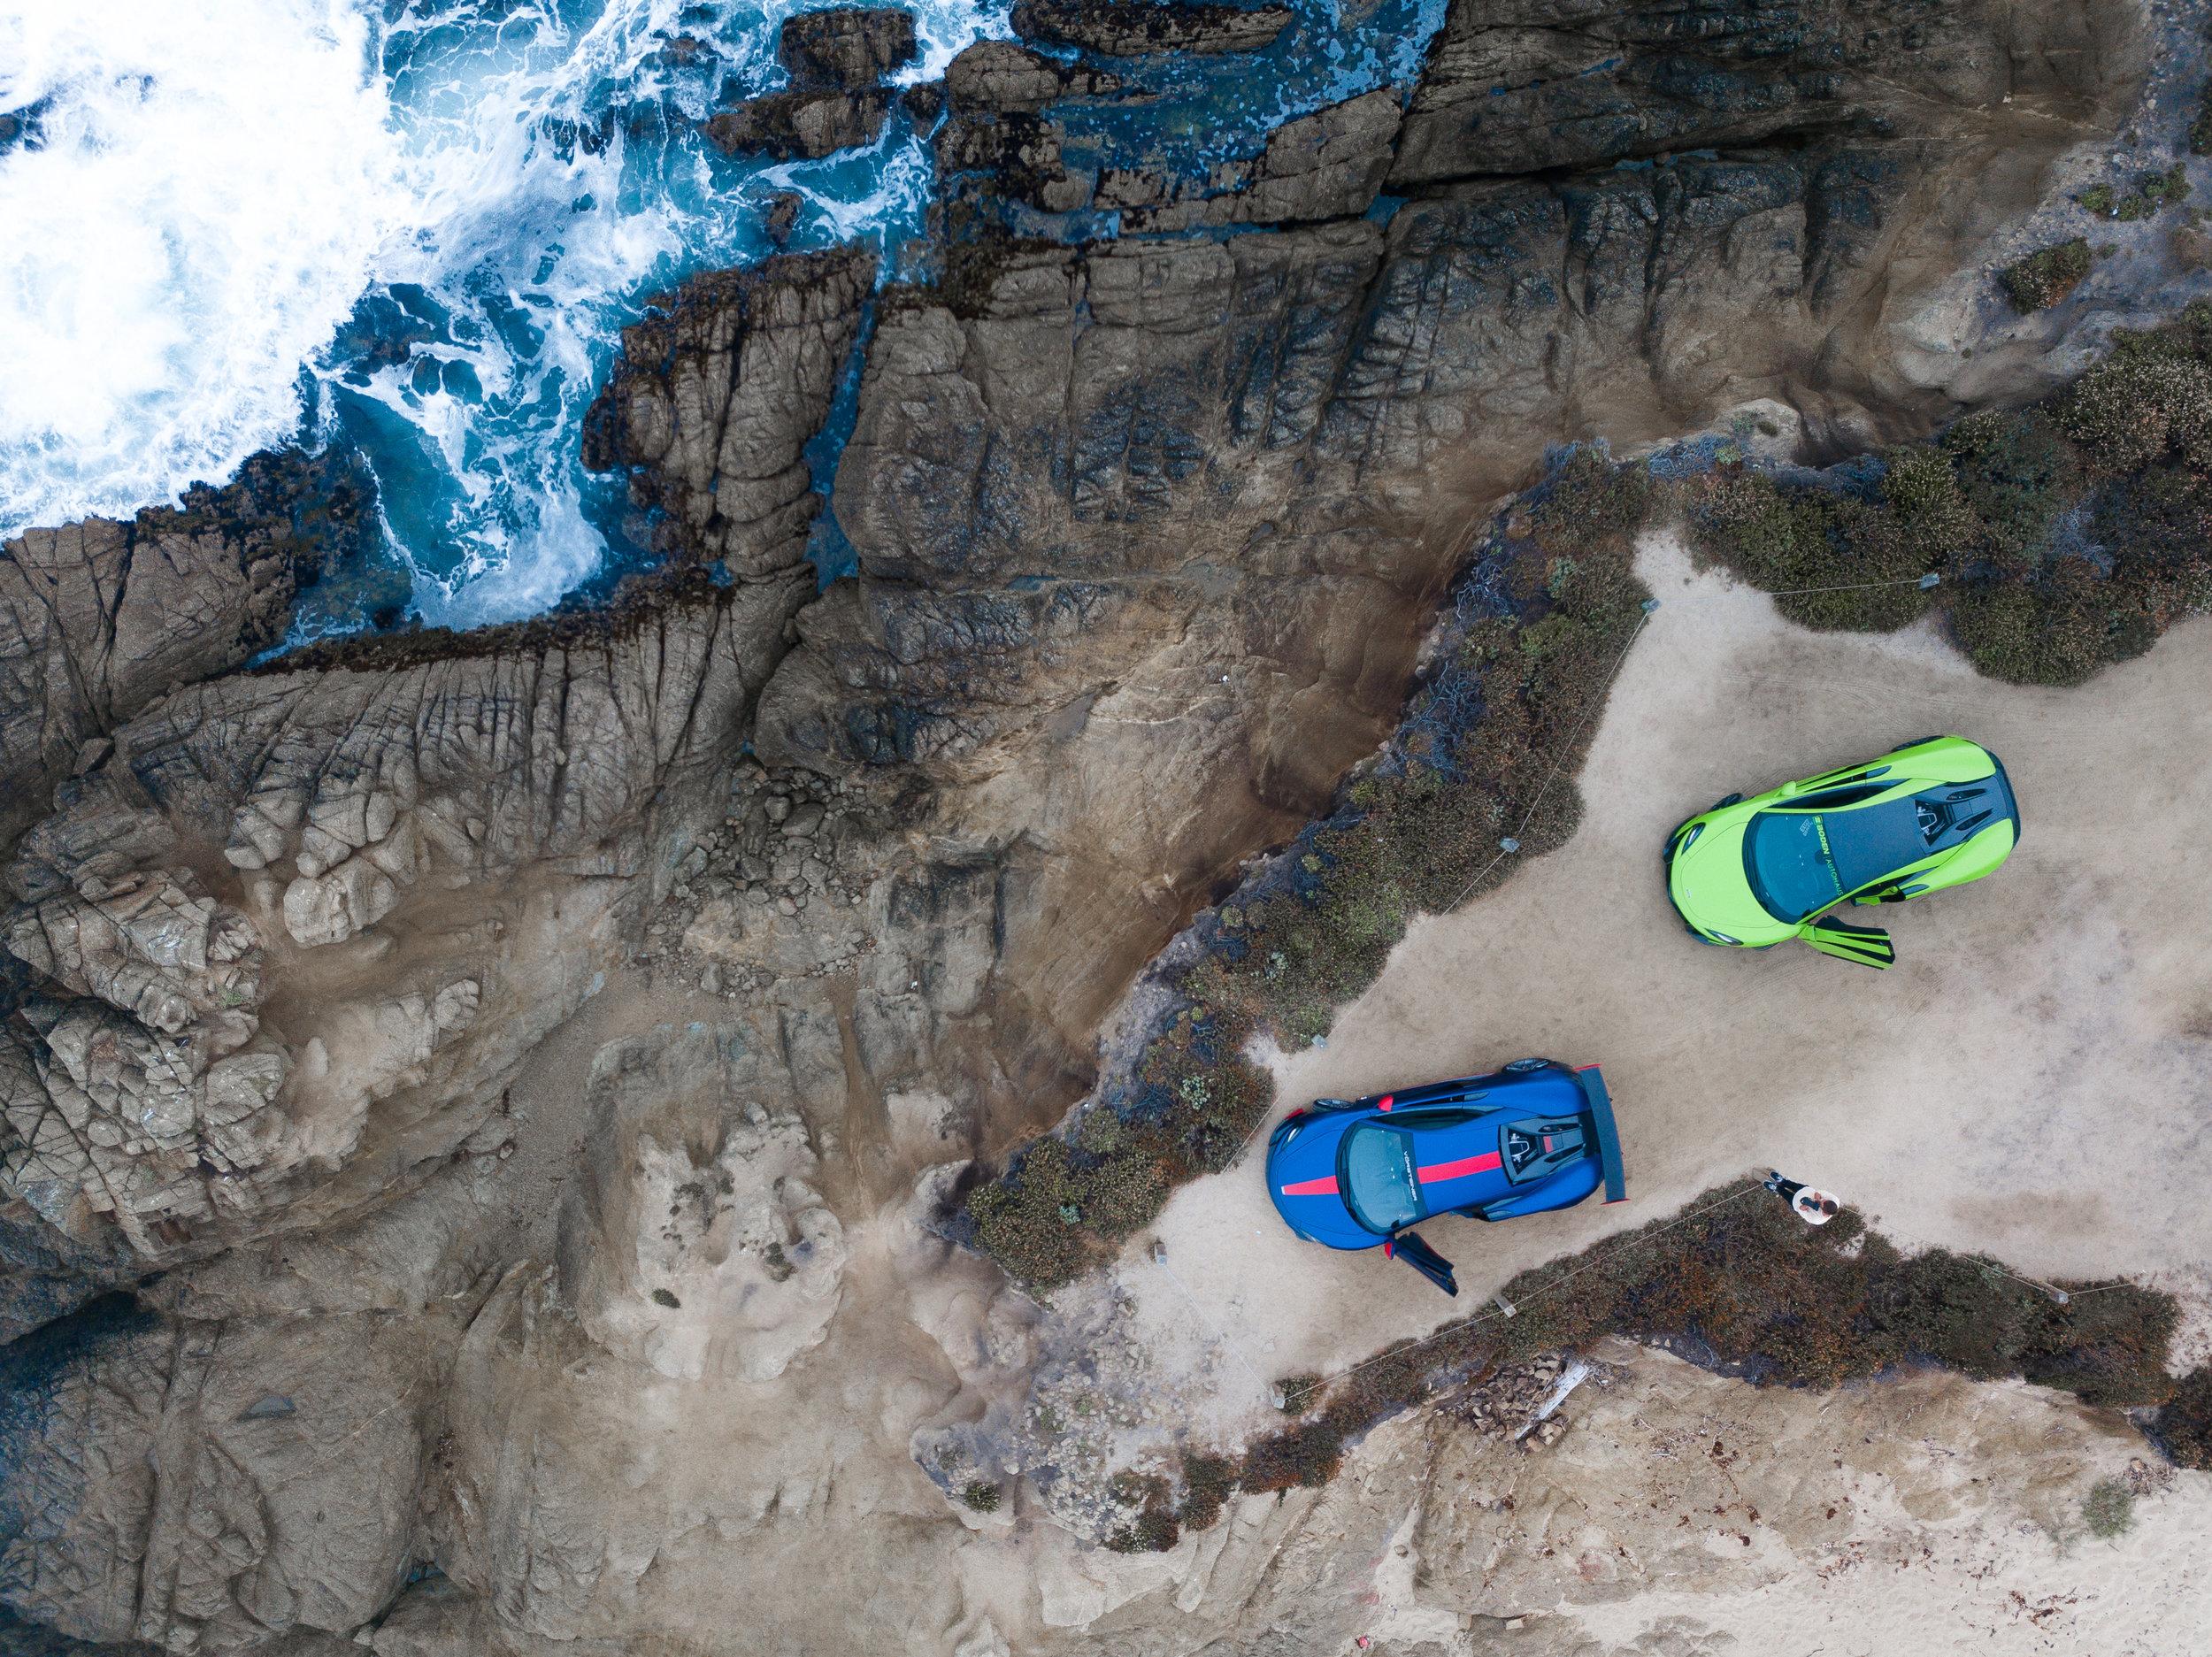 Stay_Driven_Monterey_Mclarens_DRONE-25.jpg